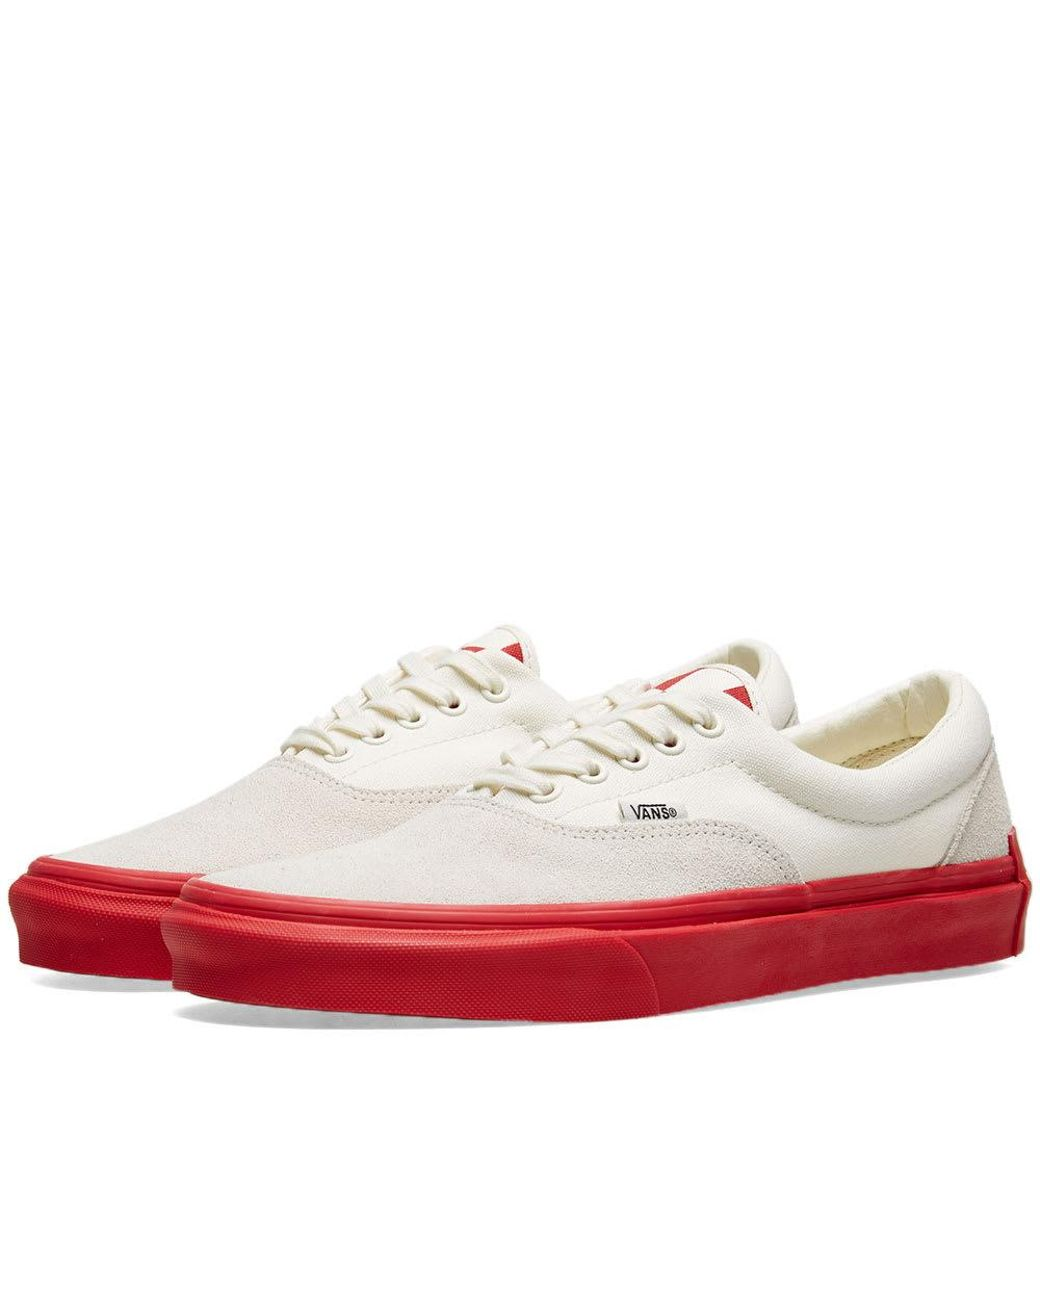 839e88b54e595d Lyst - Vans Vault Ua Era X Purlicue Sneakers in White - Save 11%